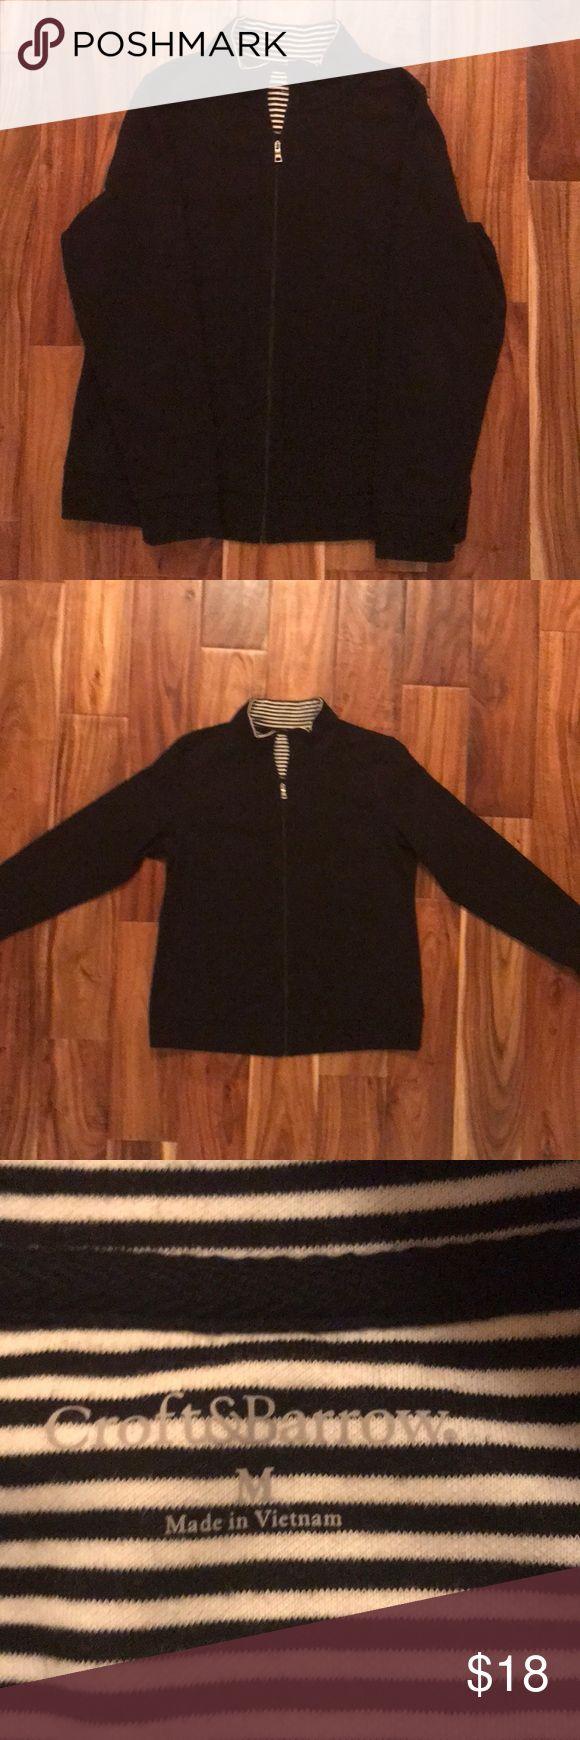 Black zip up, Croft and Barrow, size medium. Black zip up, Croft and Barrow, size medium. croft & barrow Tops Sweatshirts & Hoodies